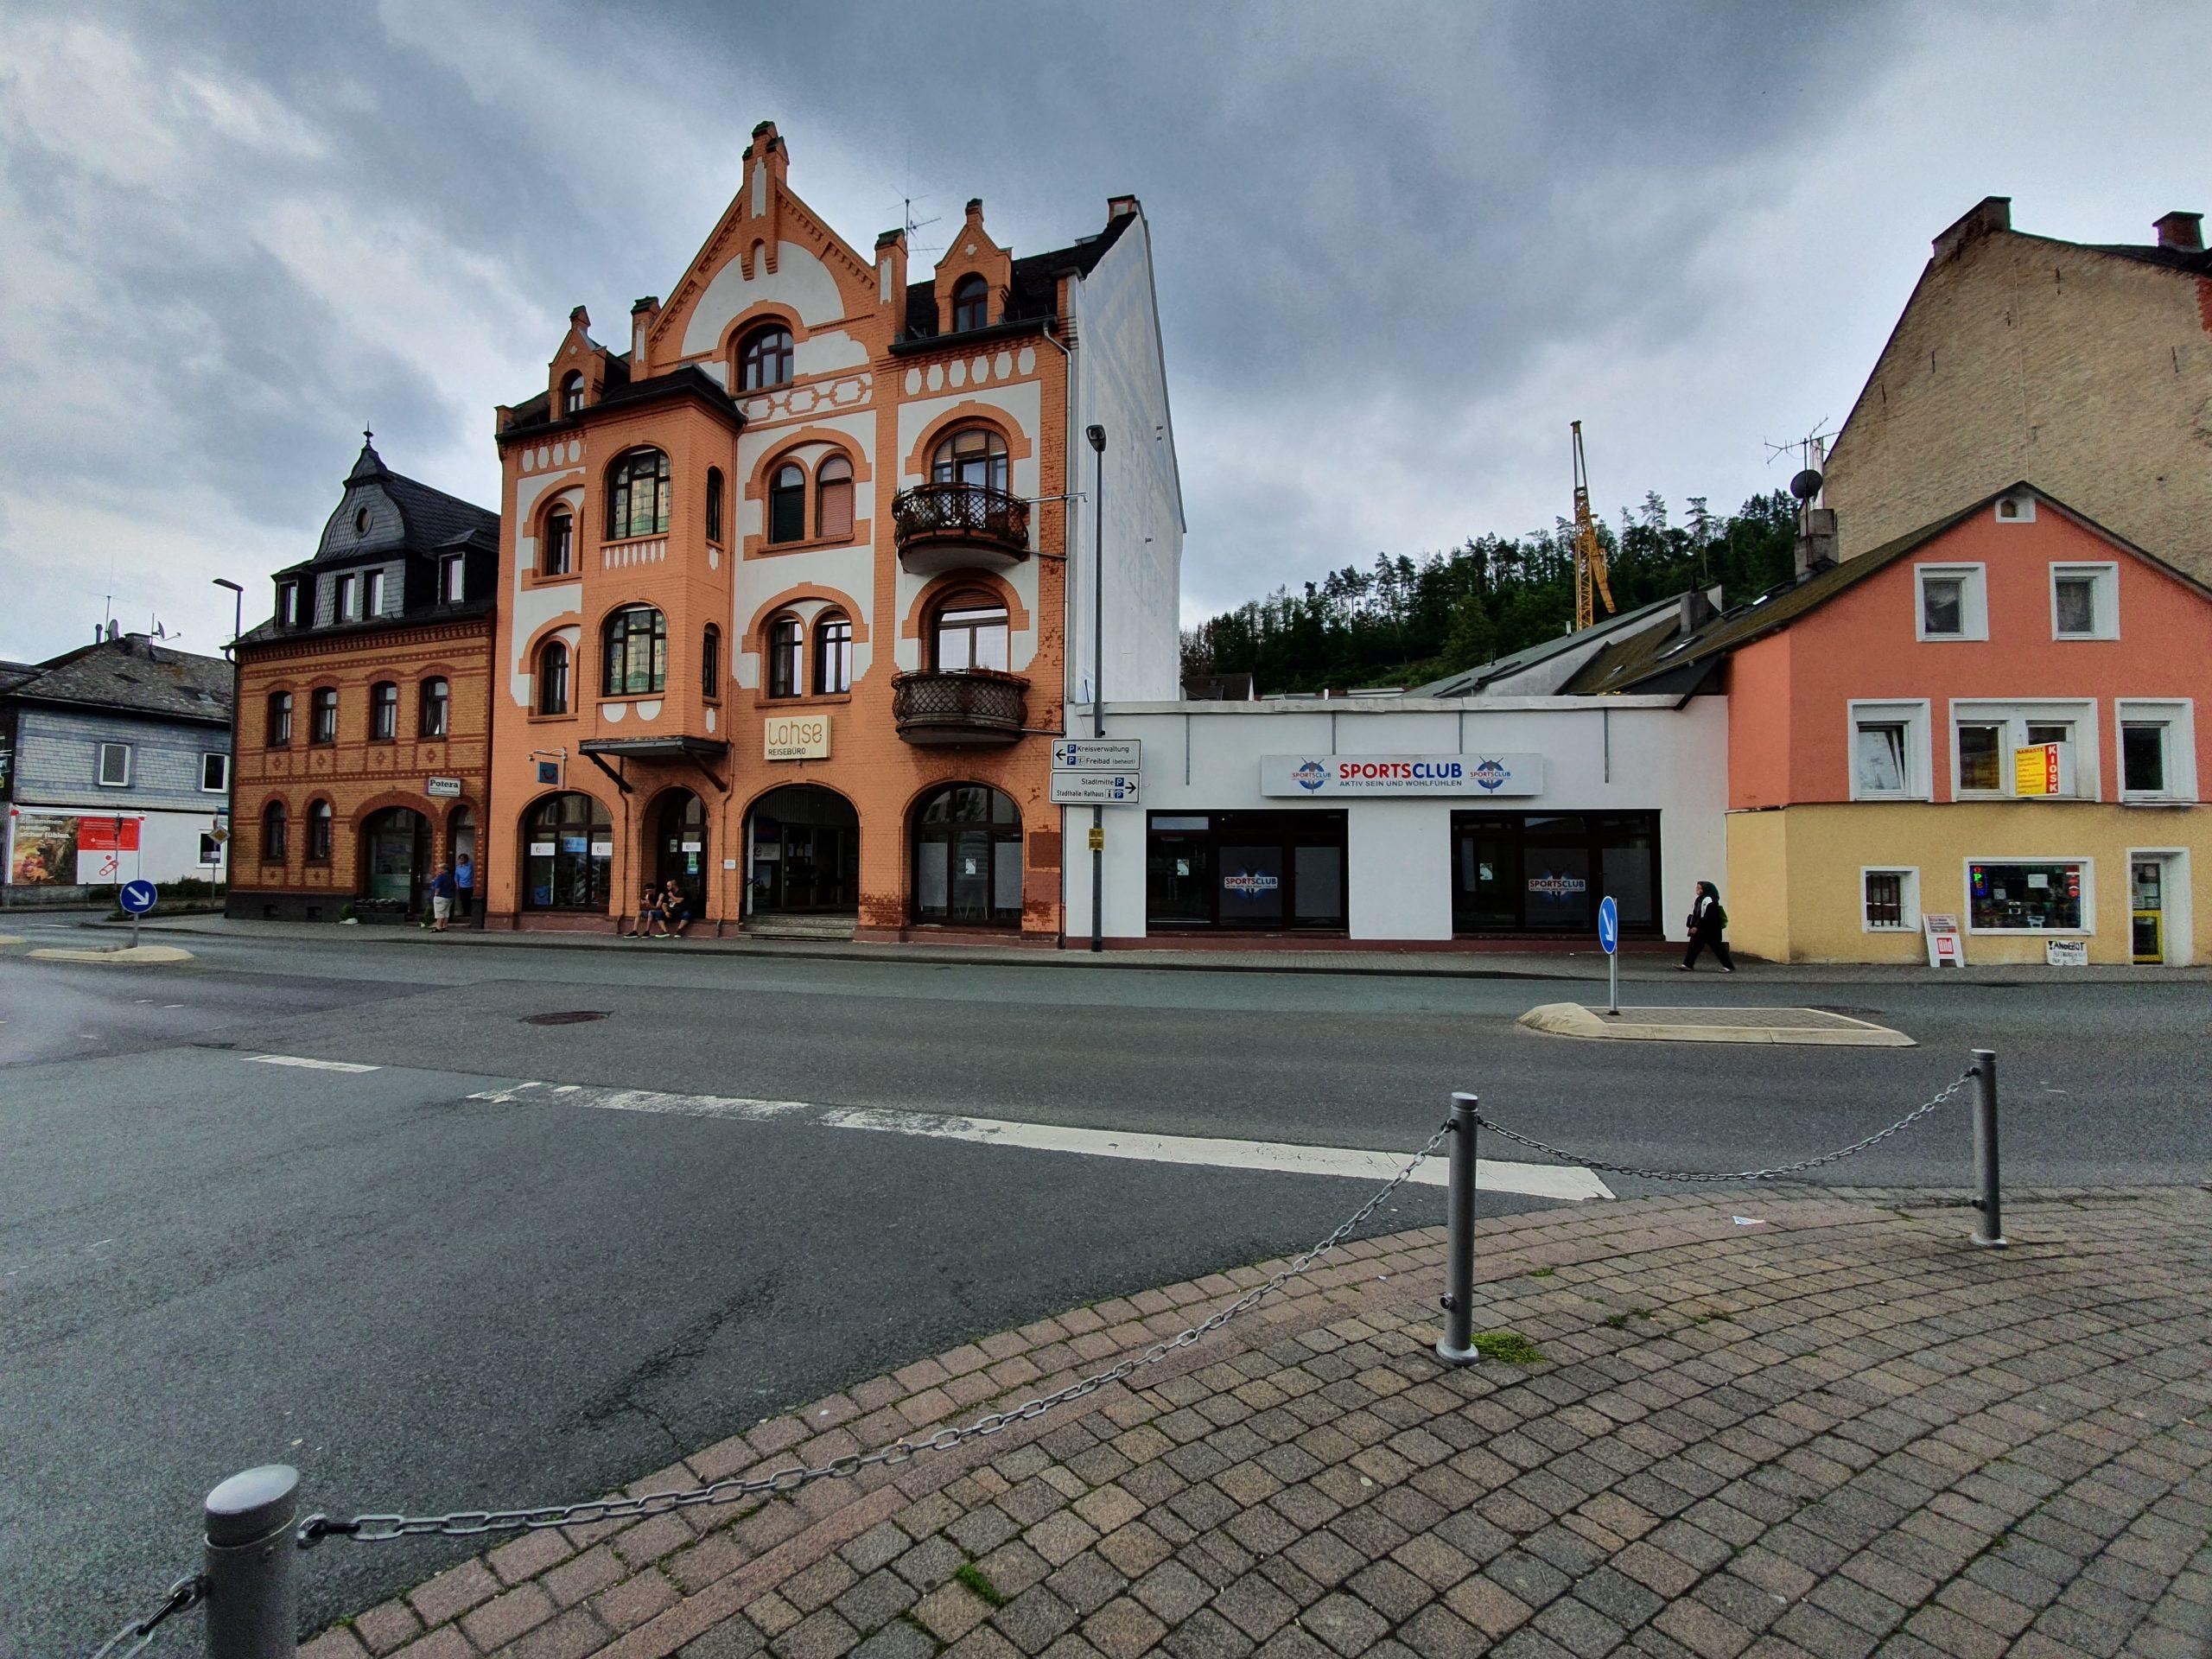 Standort - Bad Schwalbach Sportsclub